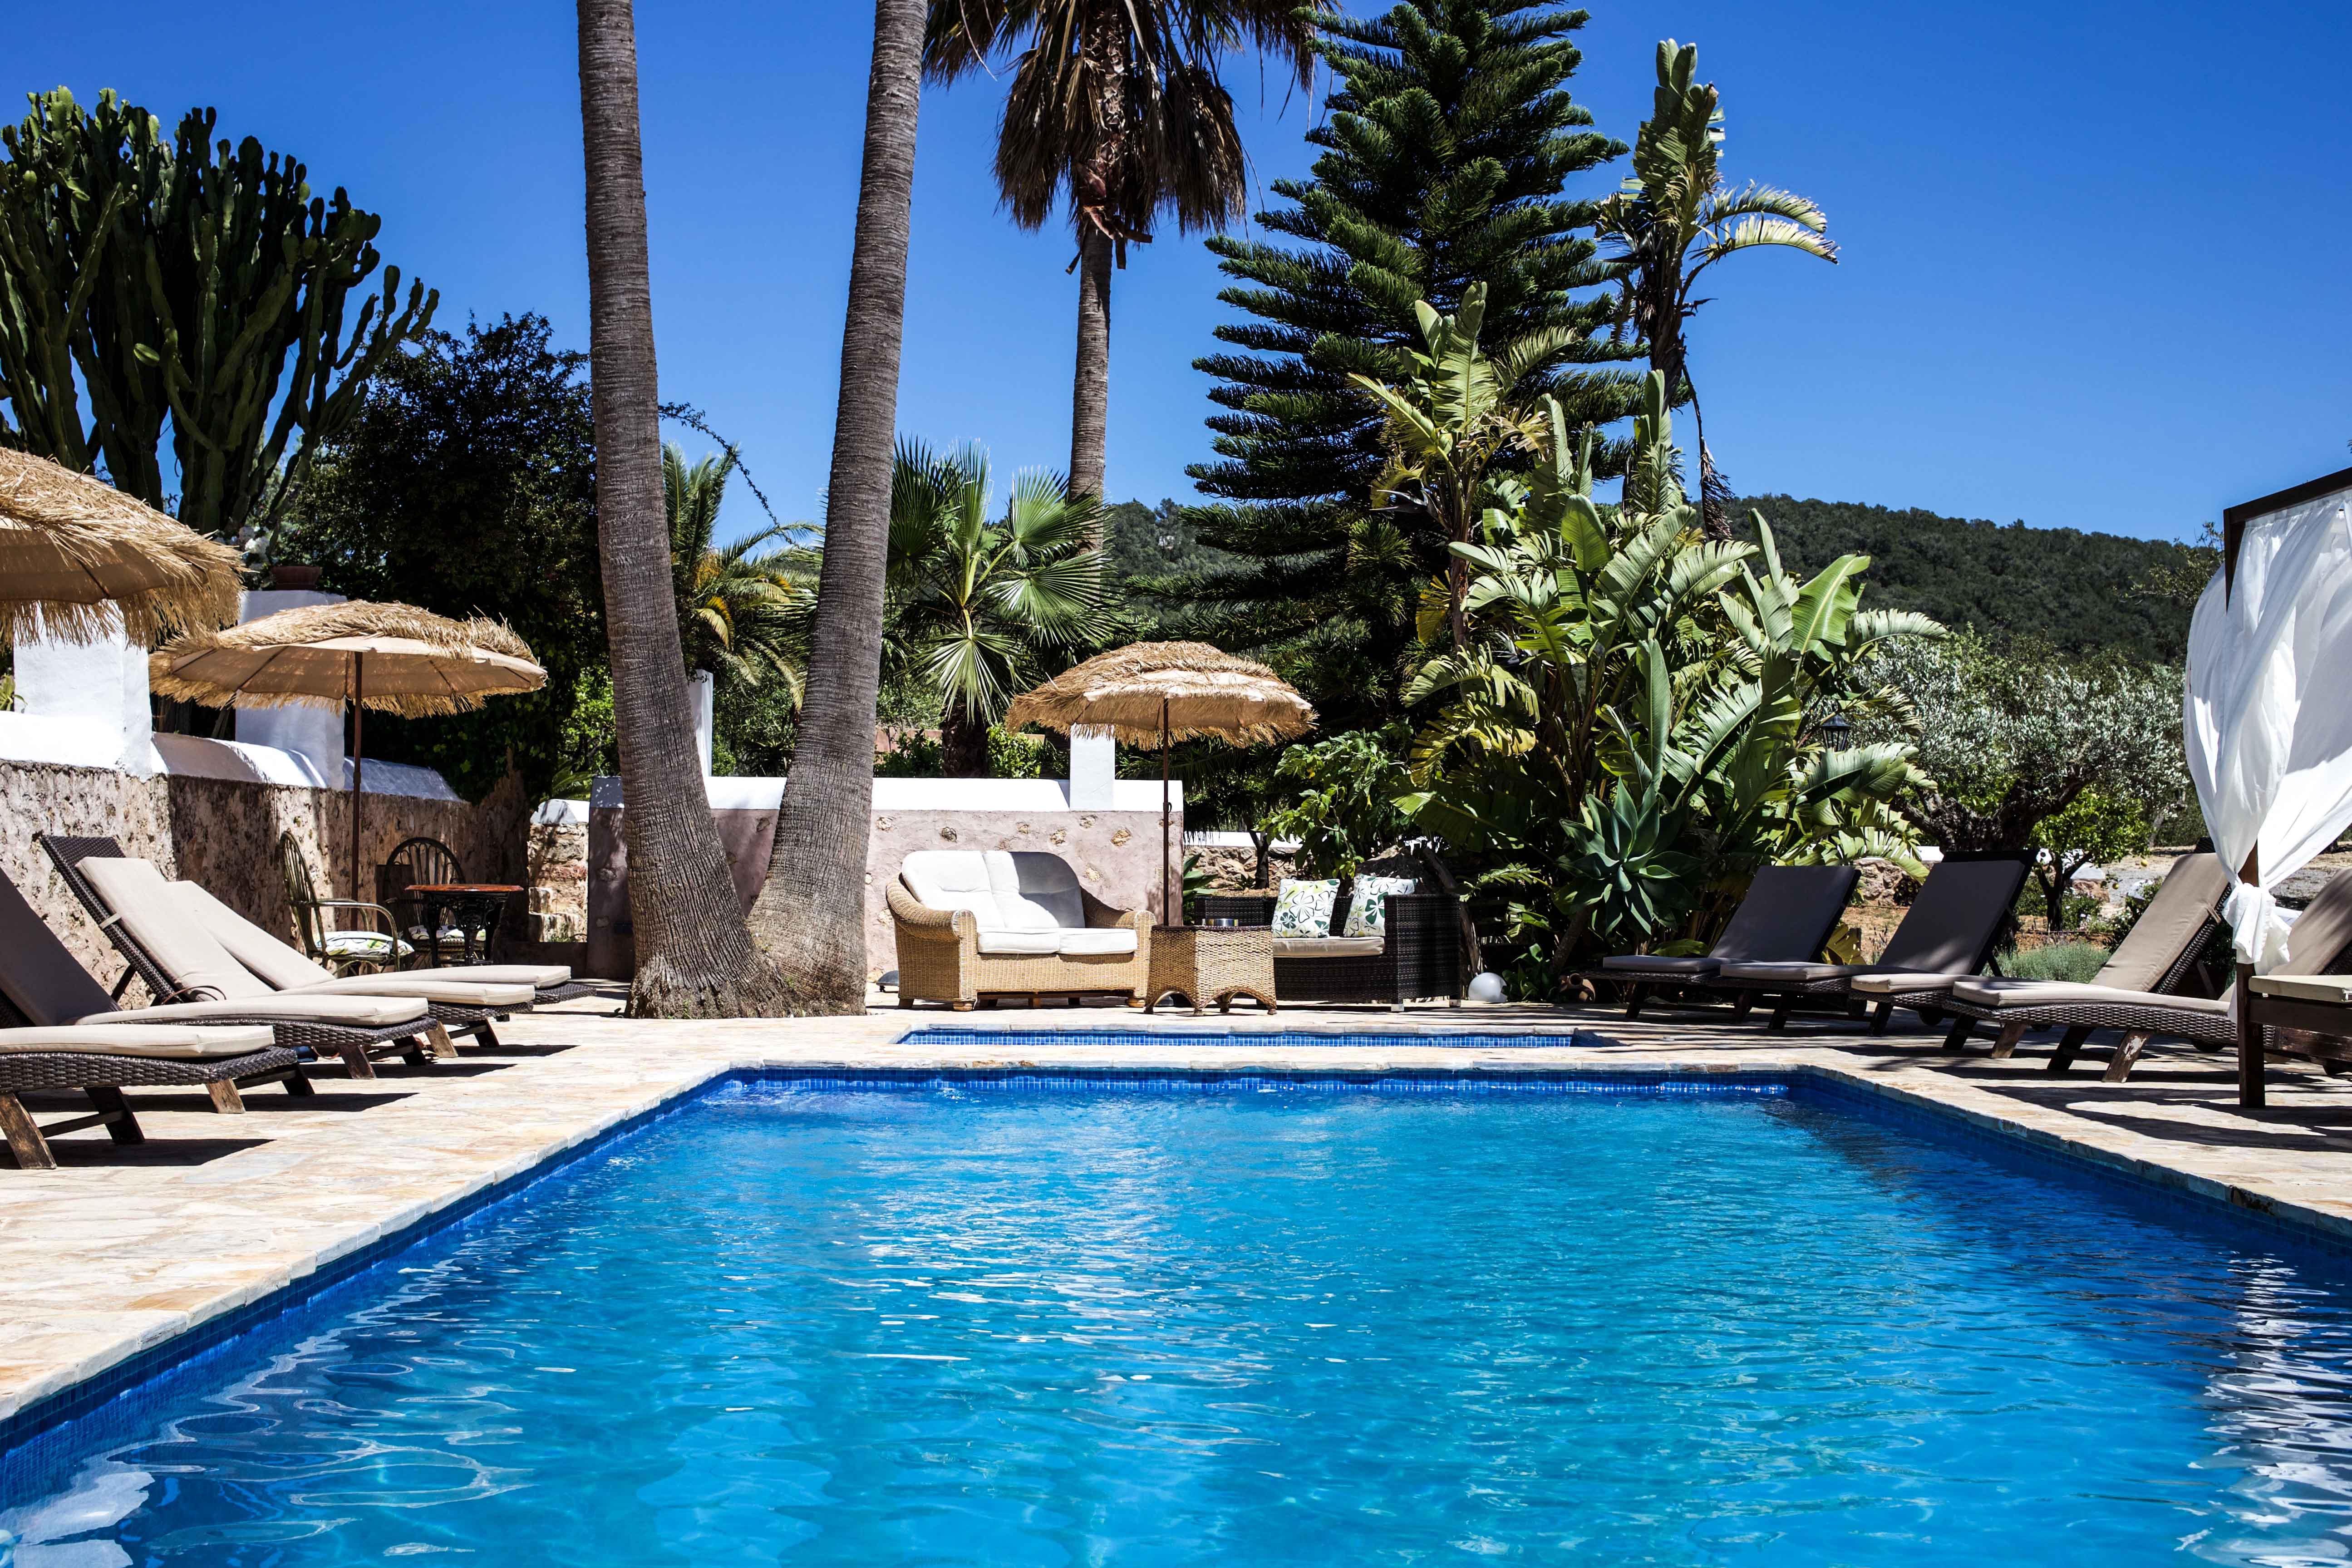 travelblog-reiseblog-ibiza-kurztrip-mädelstrip-luxus-villa_9140